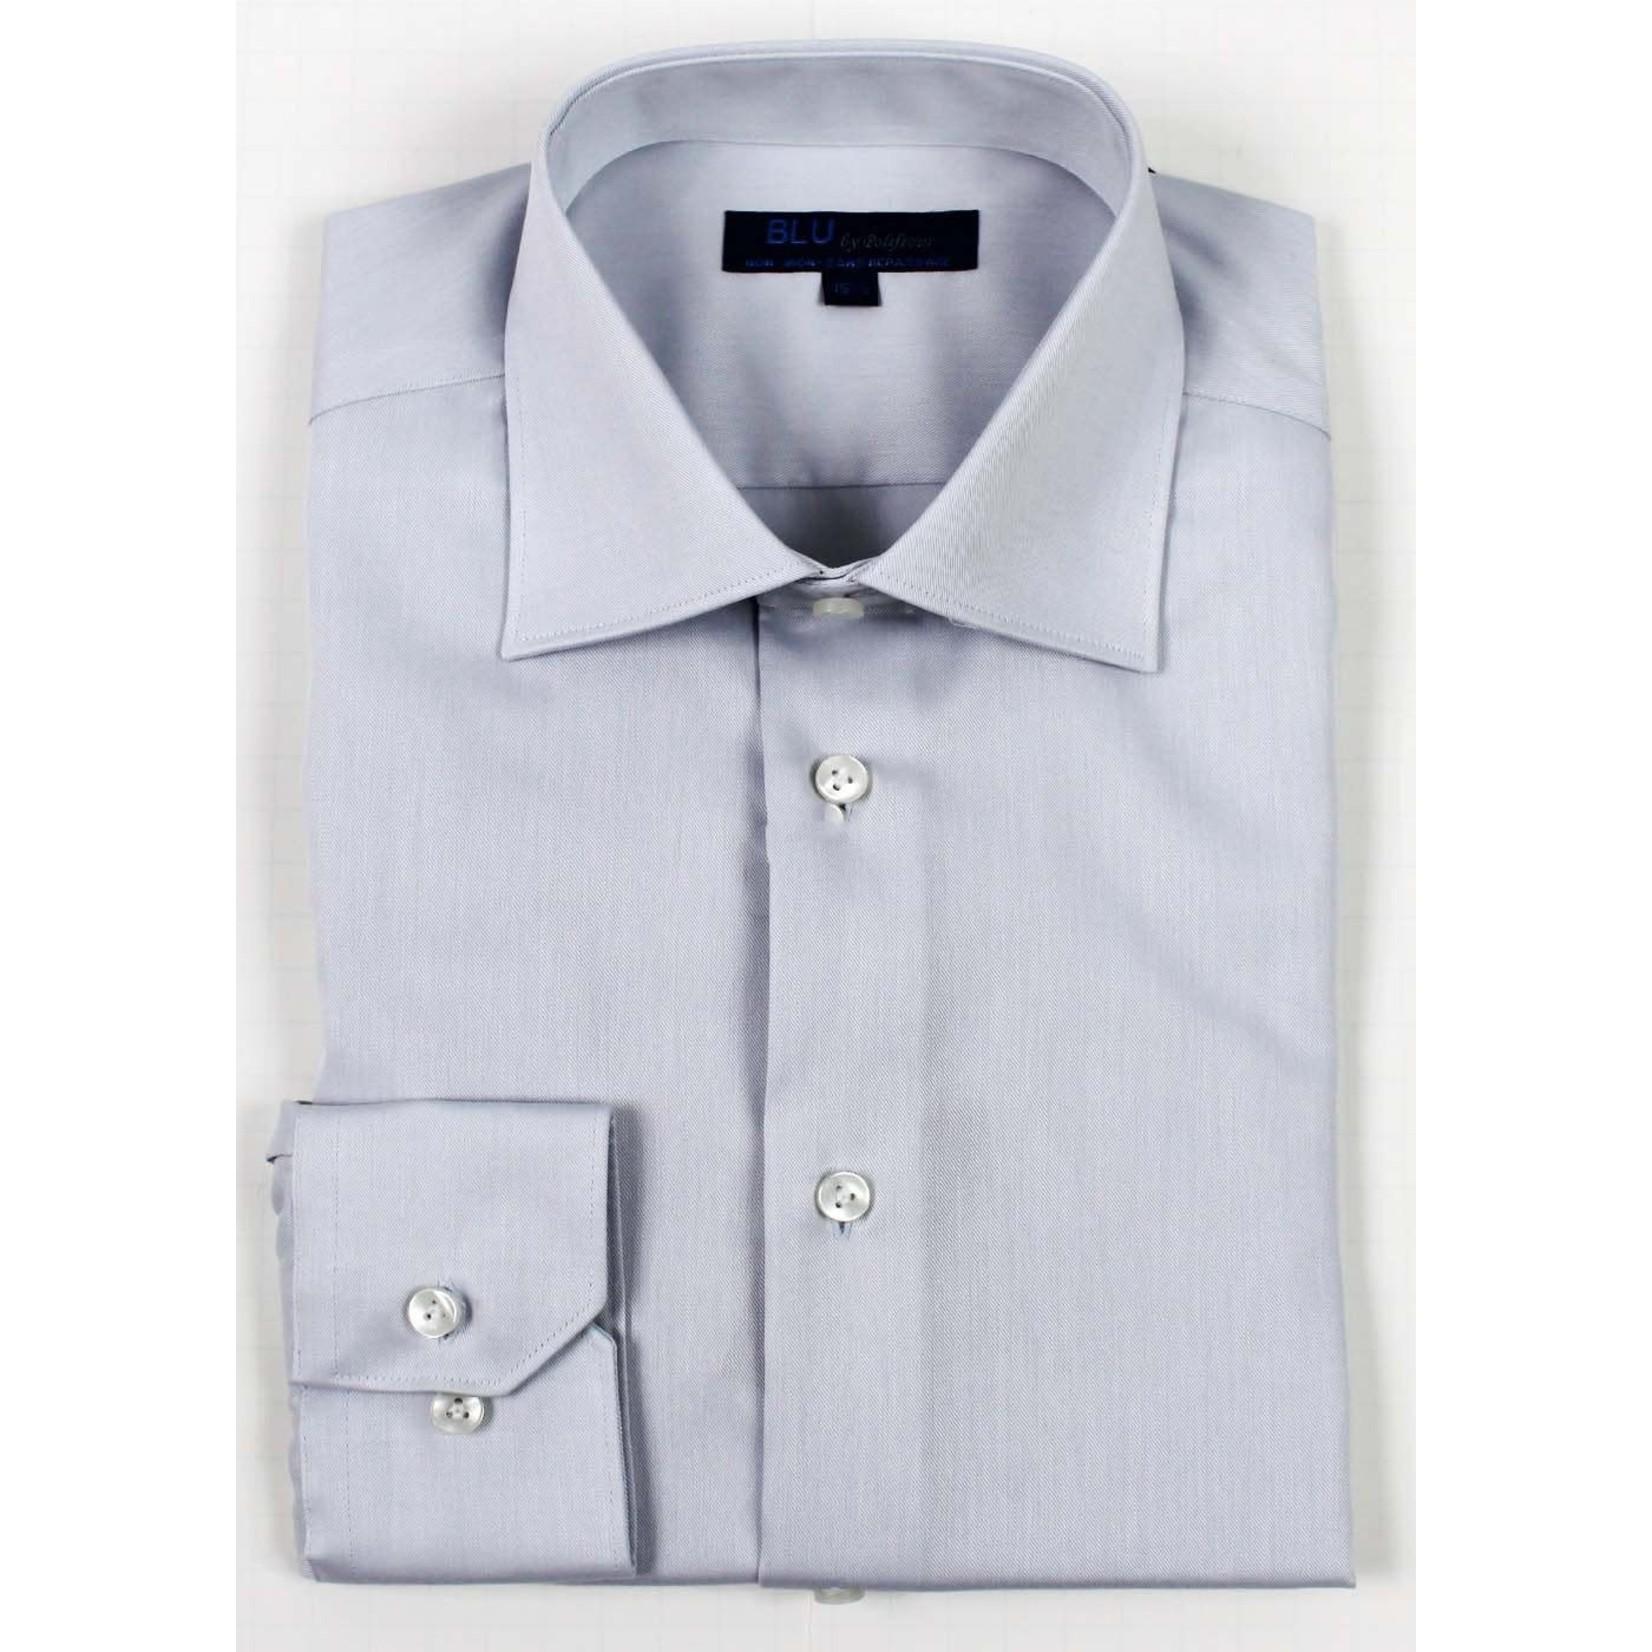 Polifroni Blu-360M Miami Non-Iron Dress Shirt 30 Silver